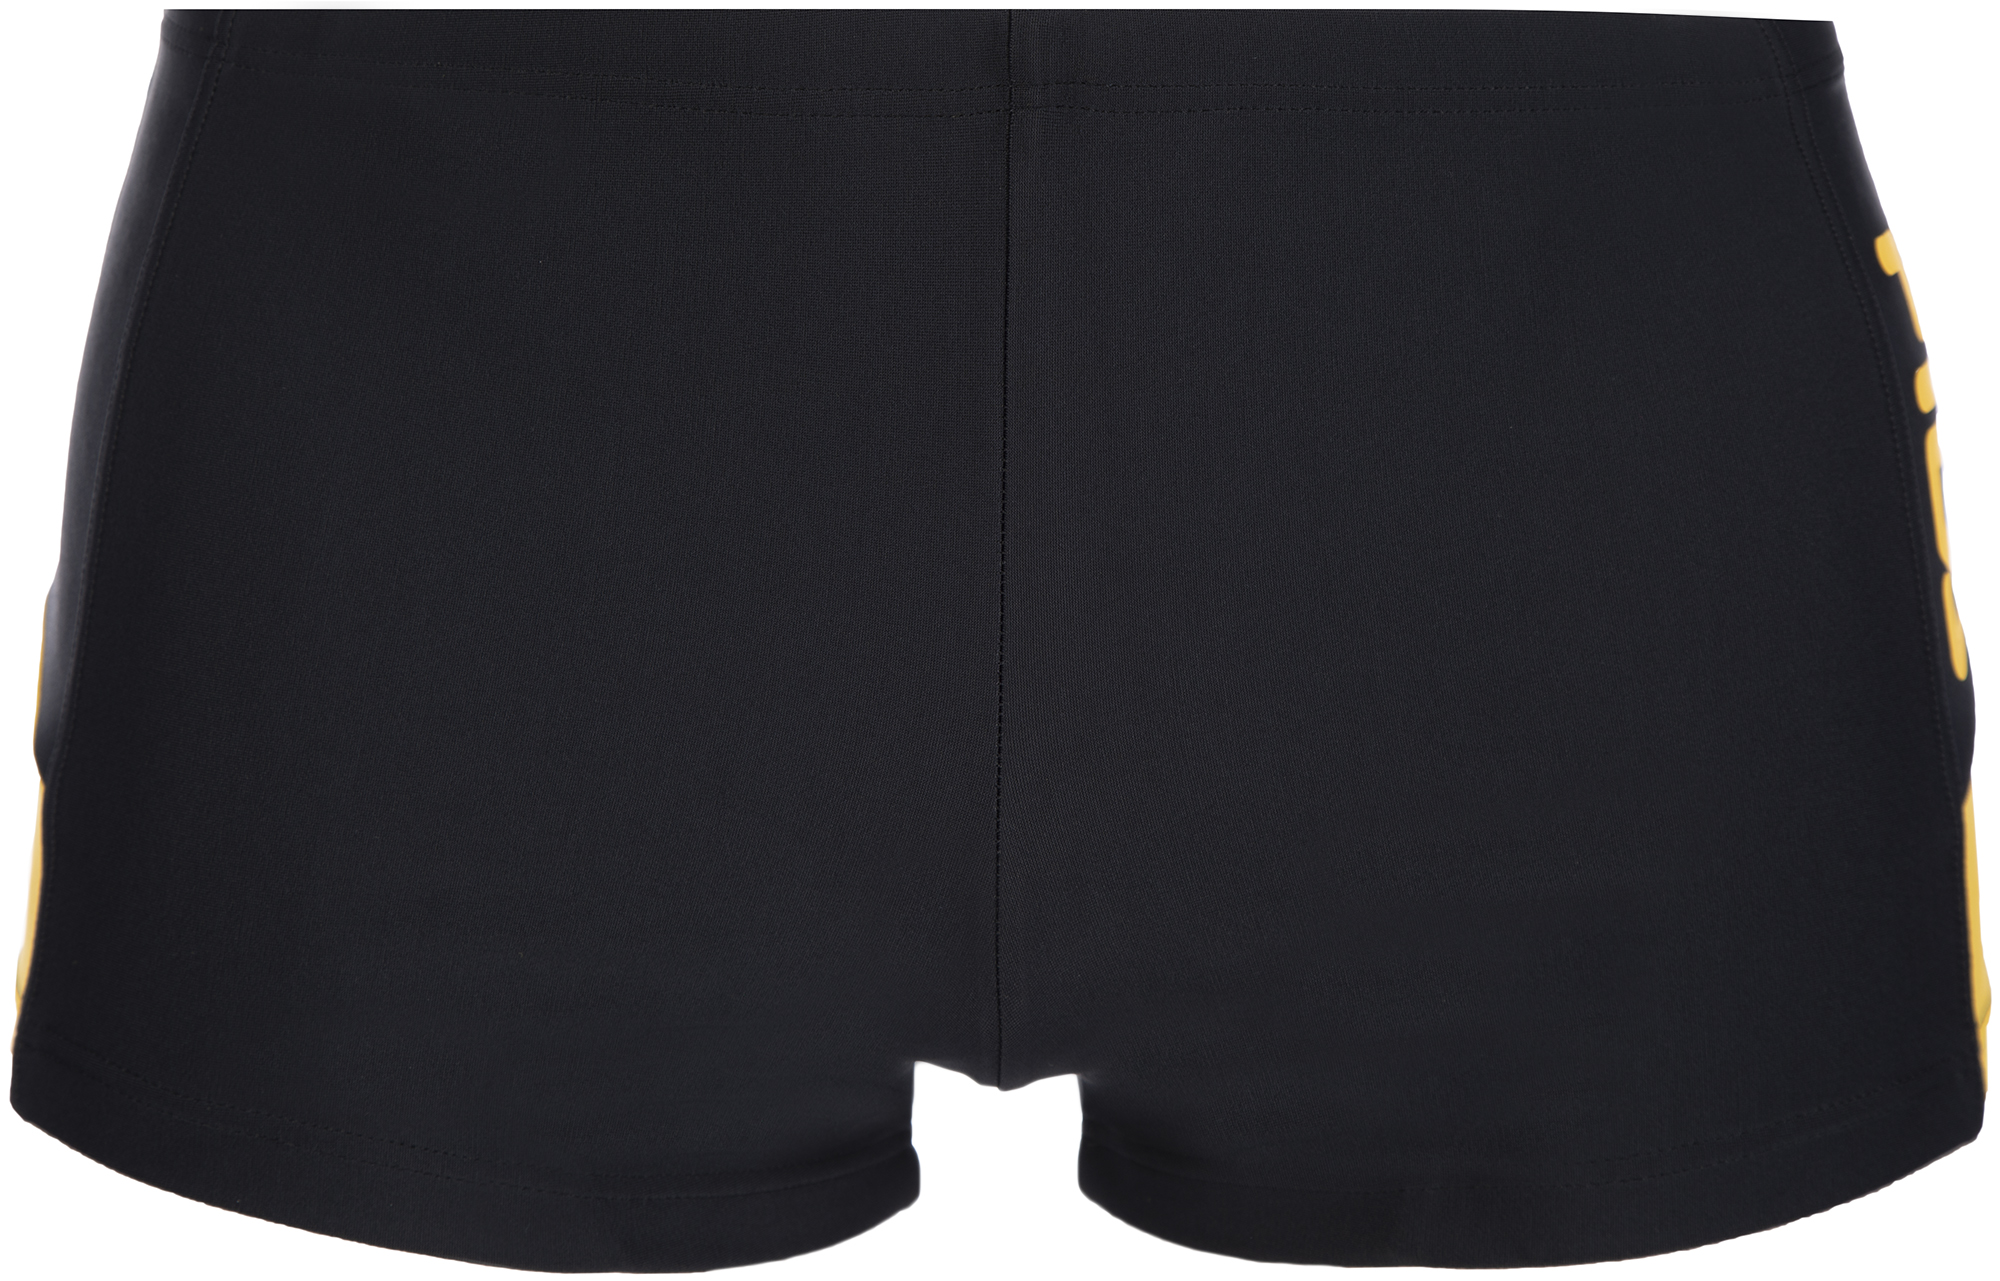 Fila Плавки-шорты мужские Fila, размер 54